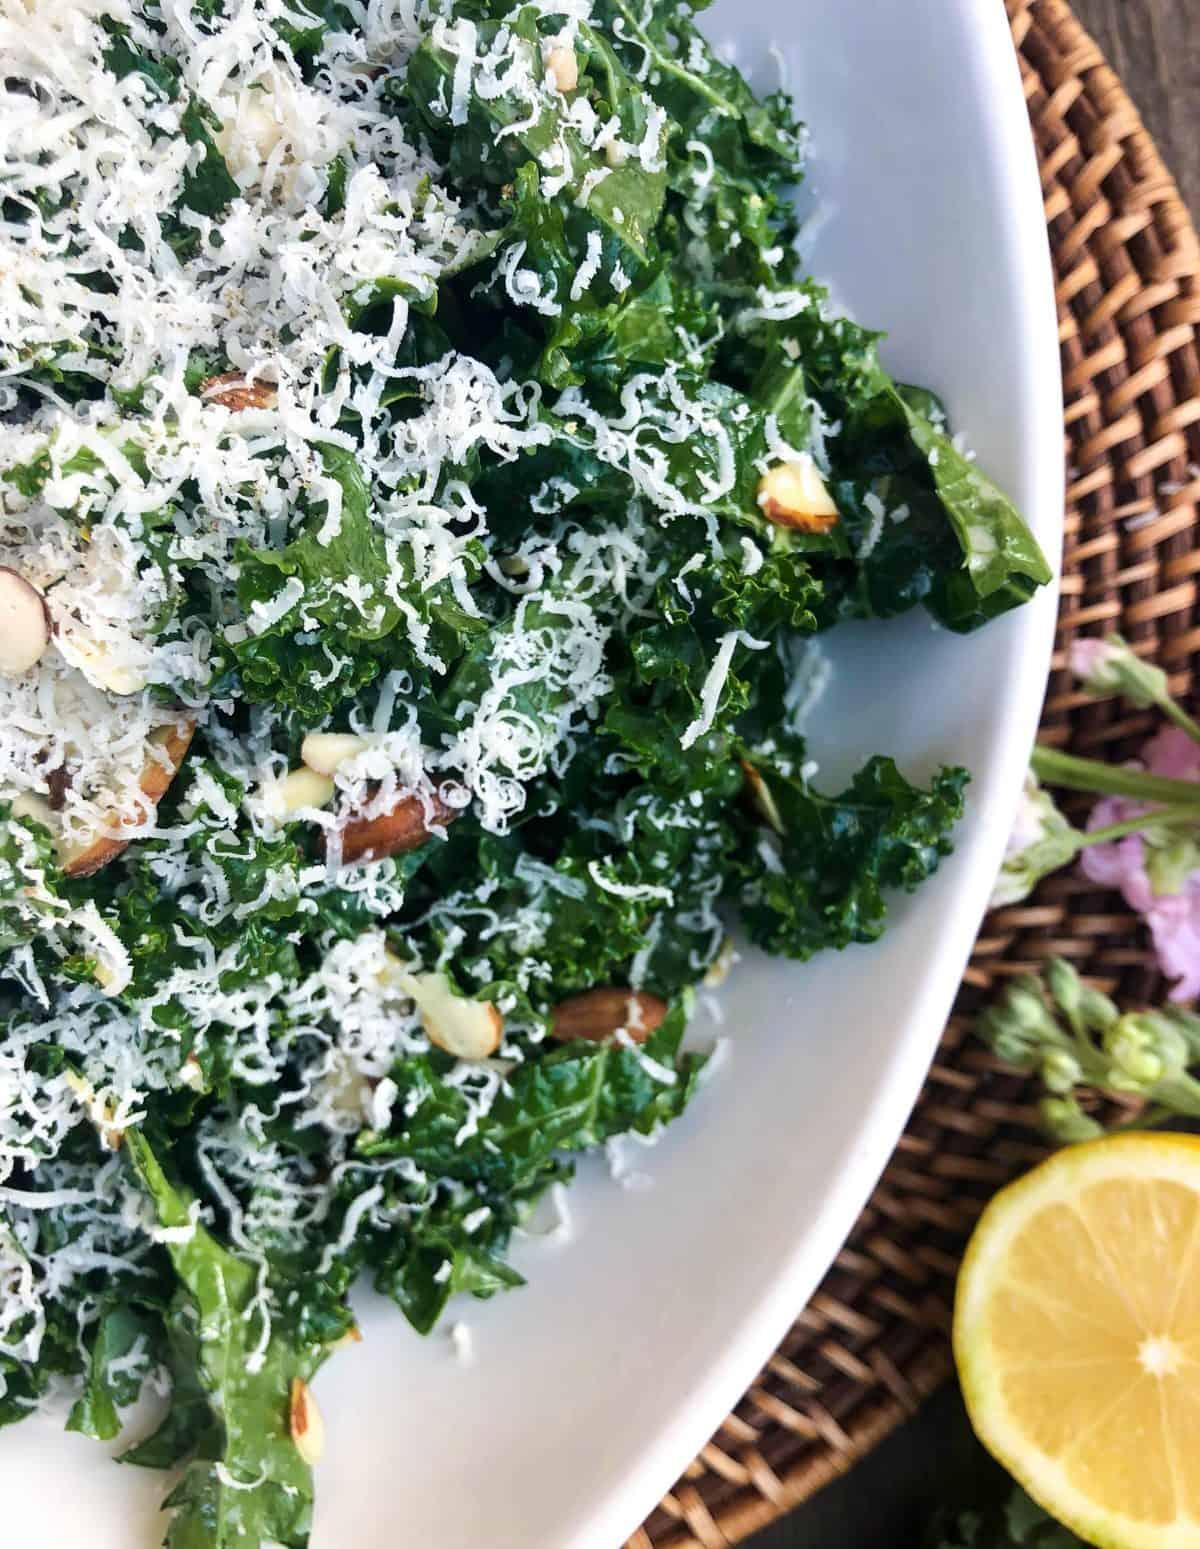 Kale Caesar Salad with Almonds